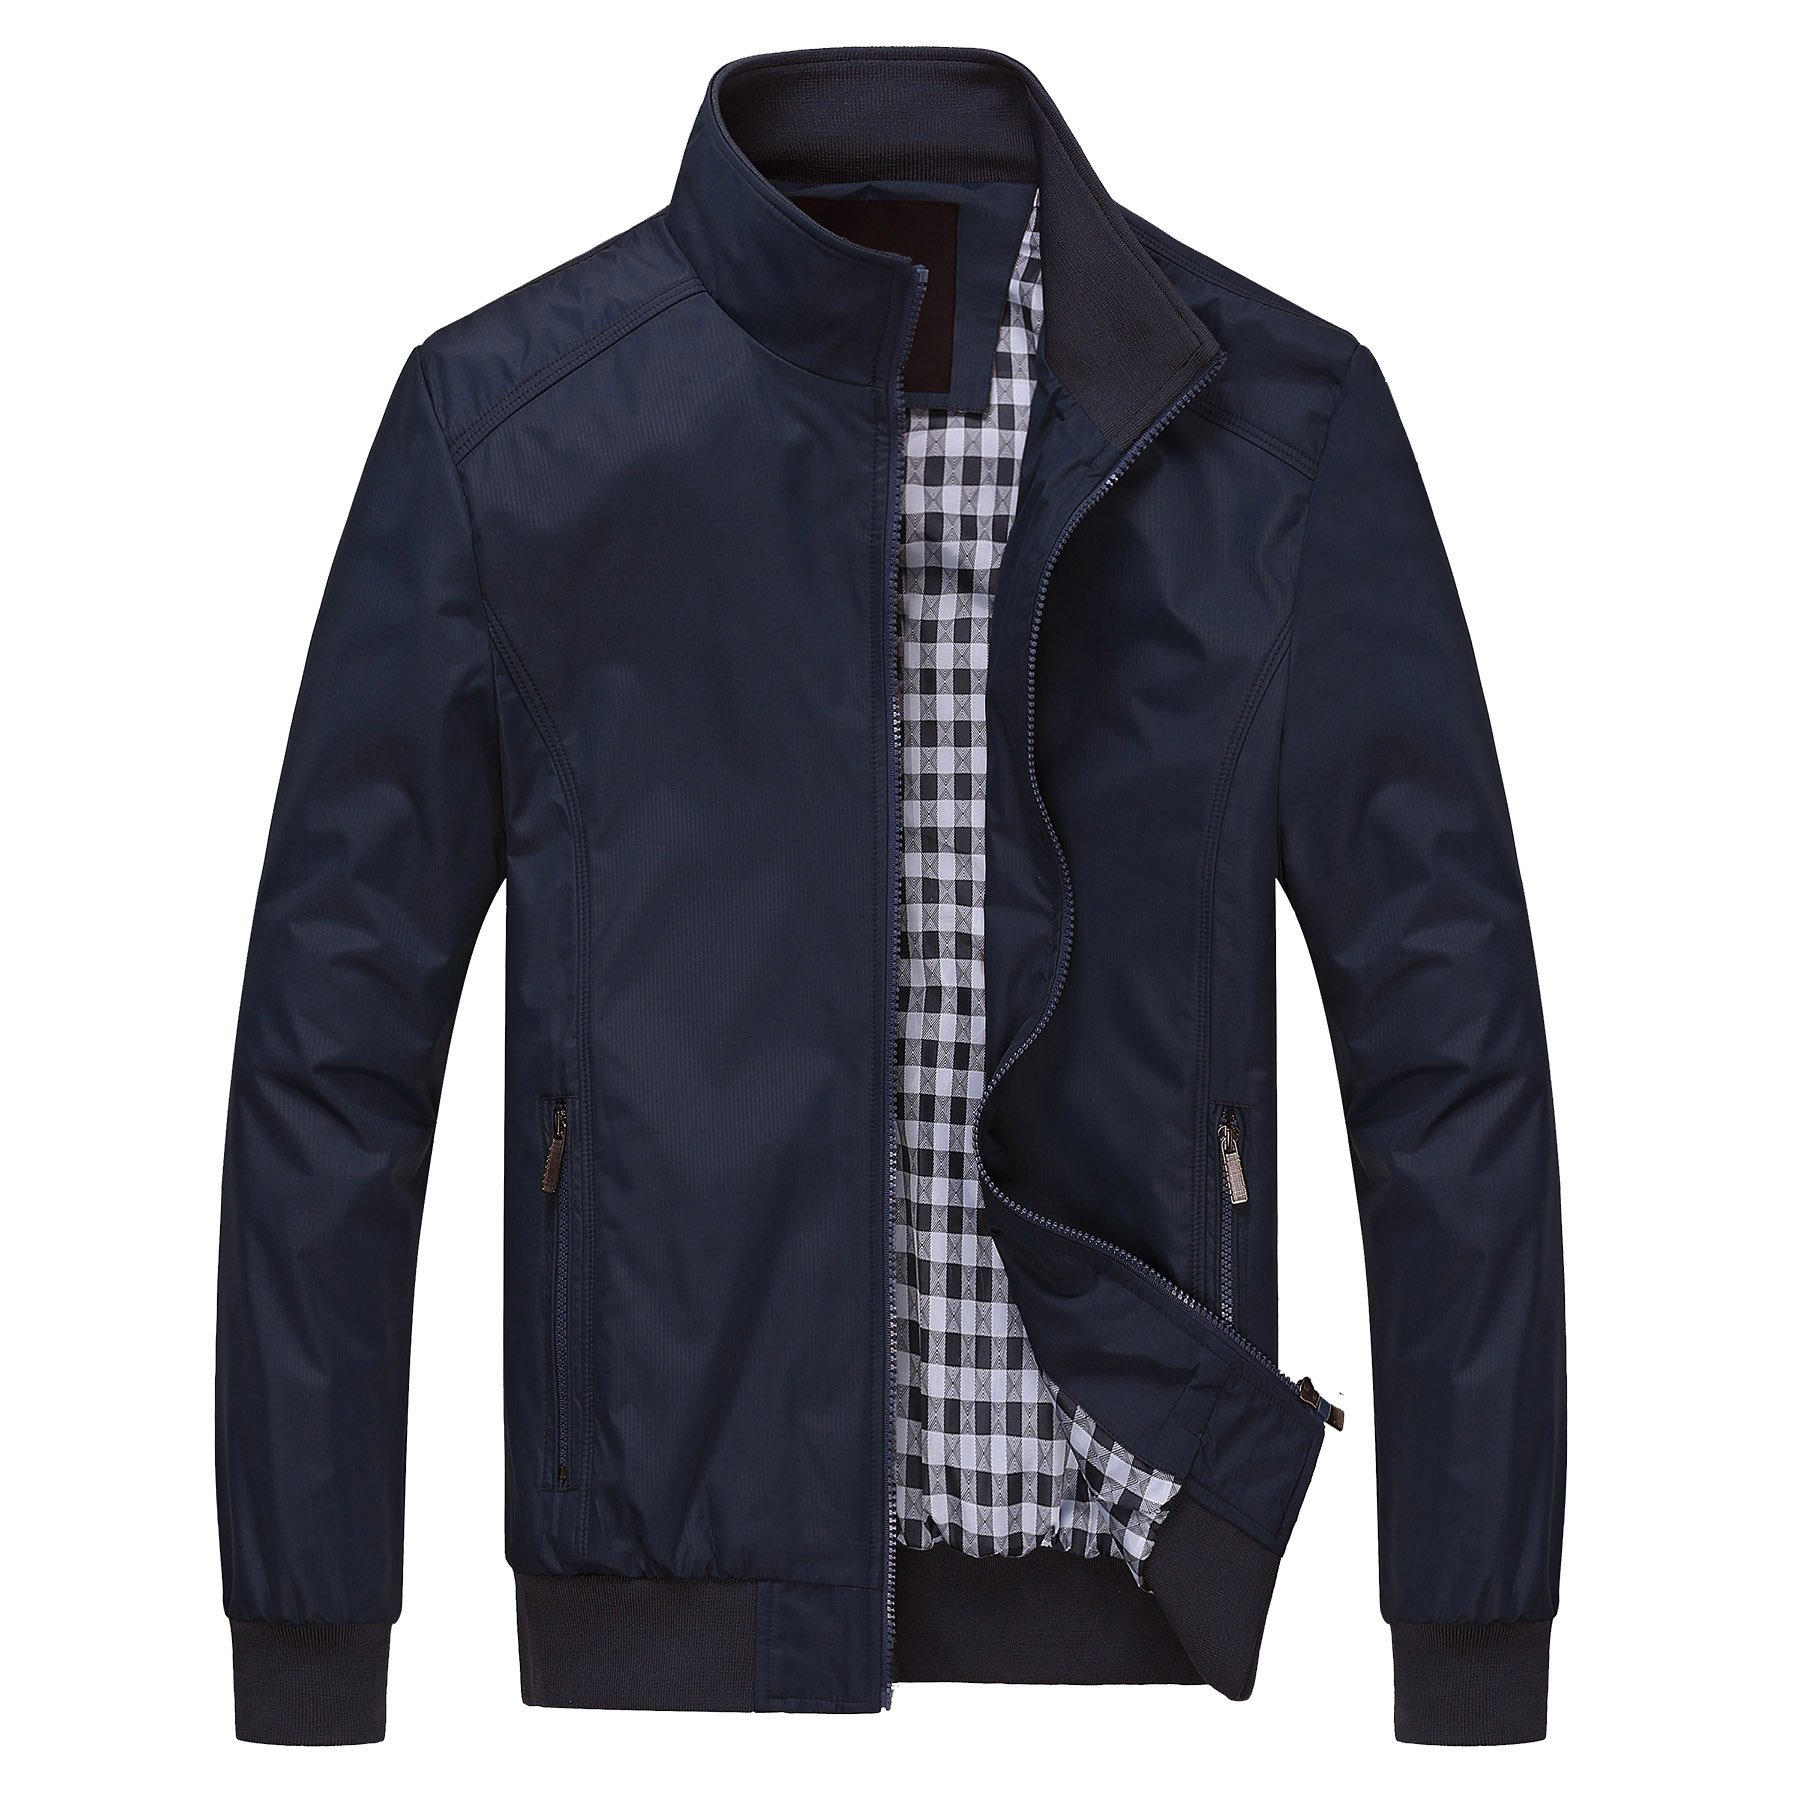 ROMINTON Men's Windproof Jacket Motorcycle Windbreaker Casual Business Jacket for Men